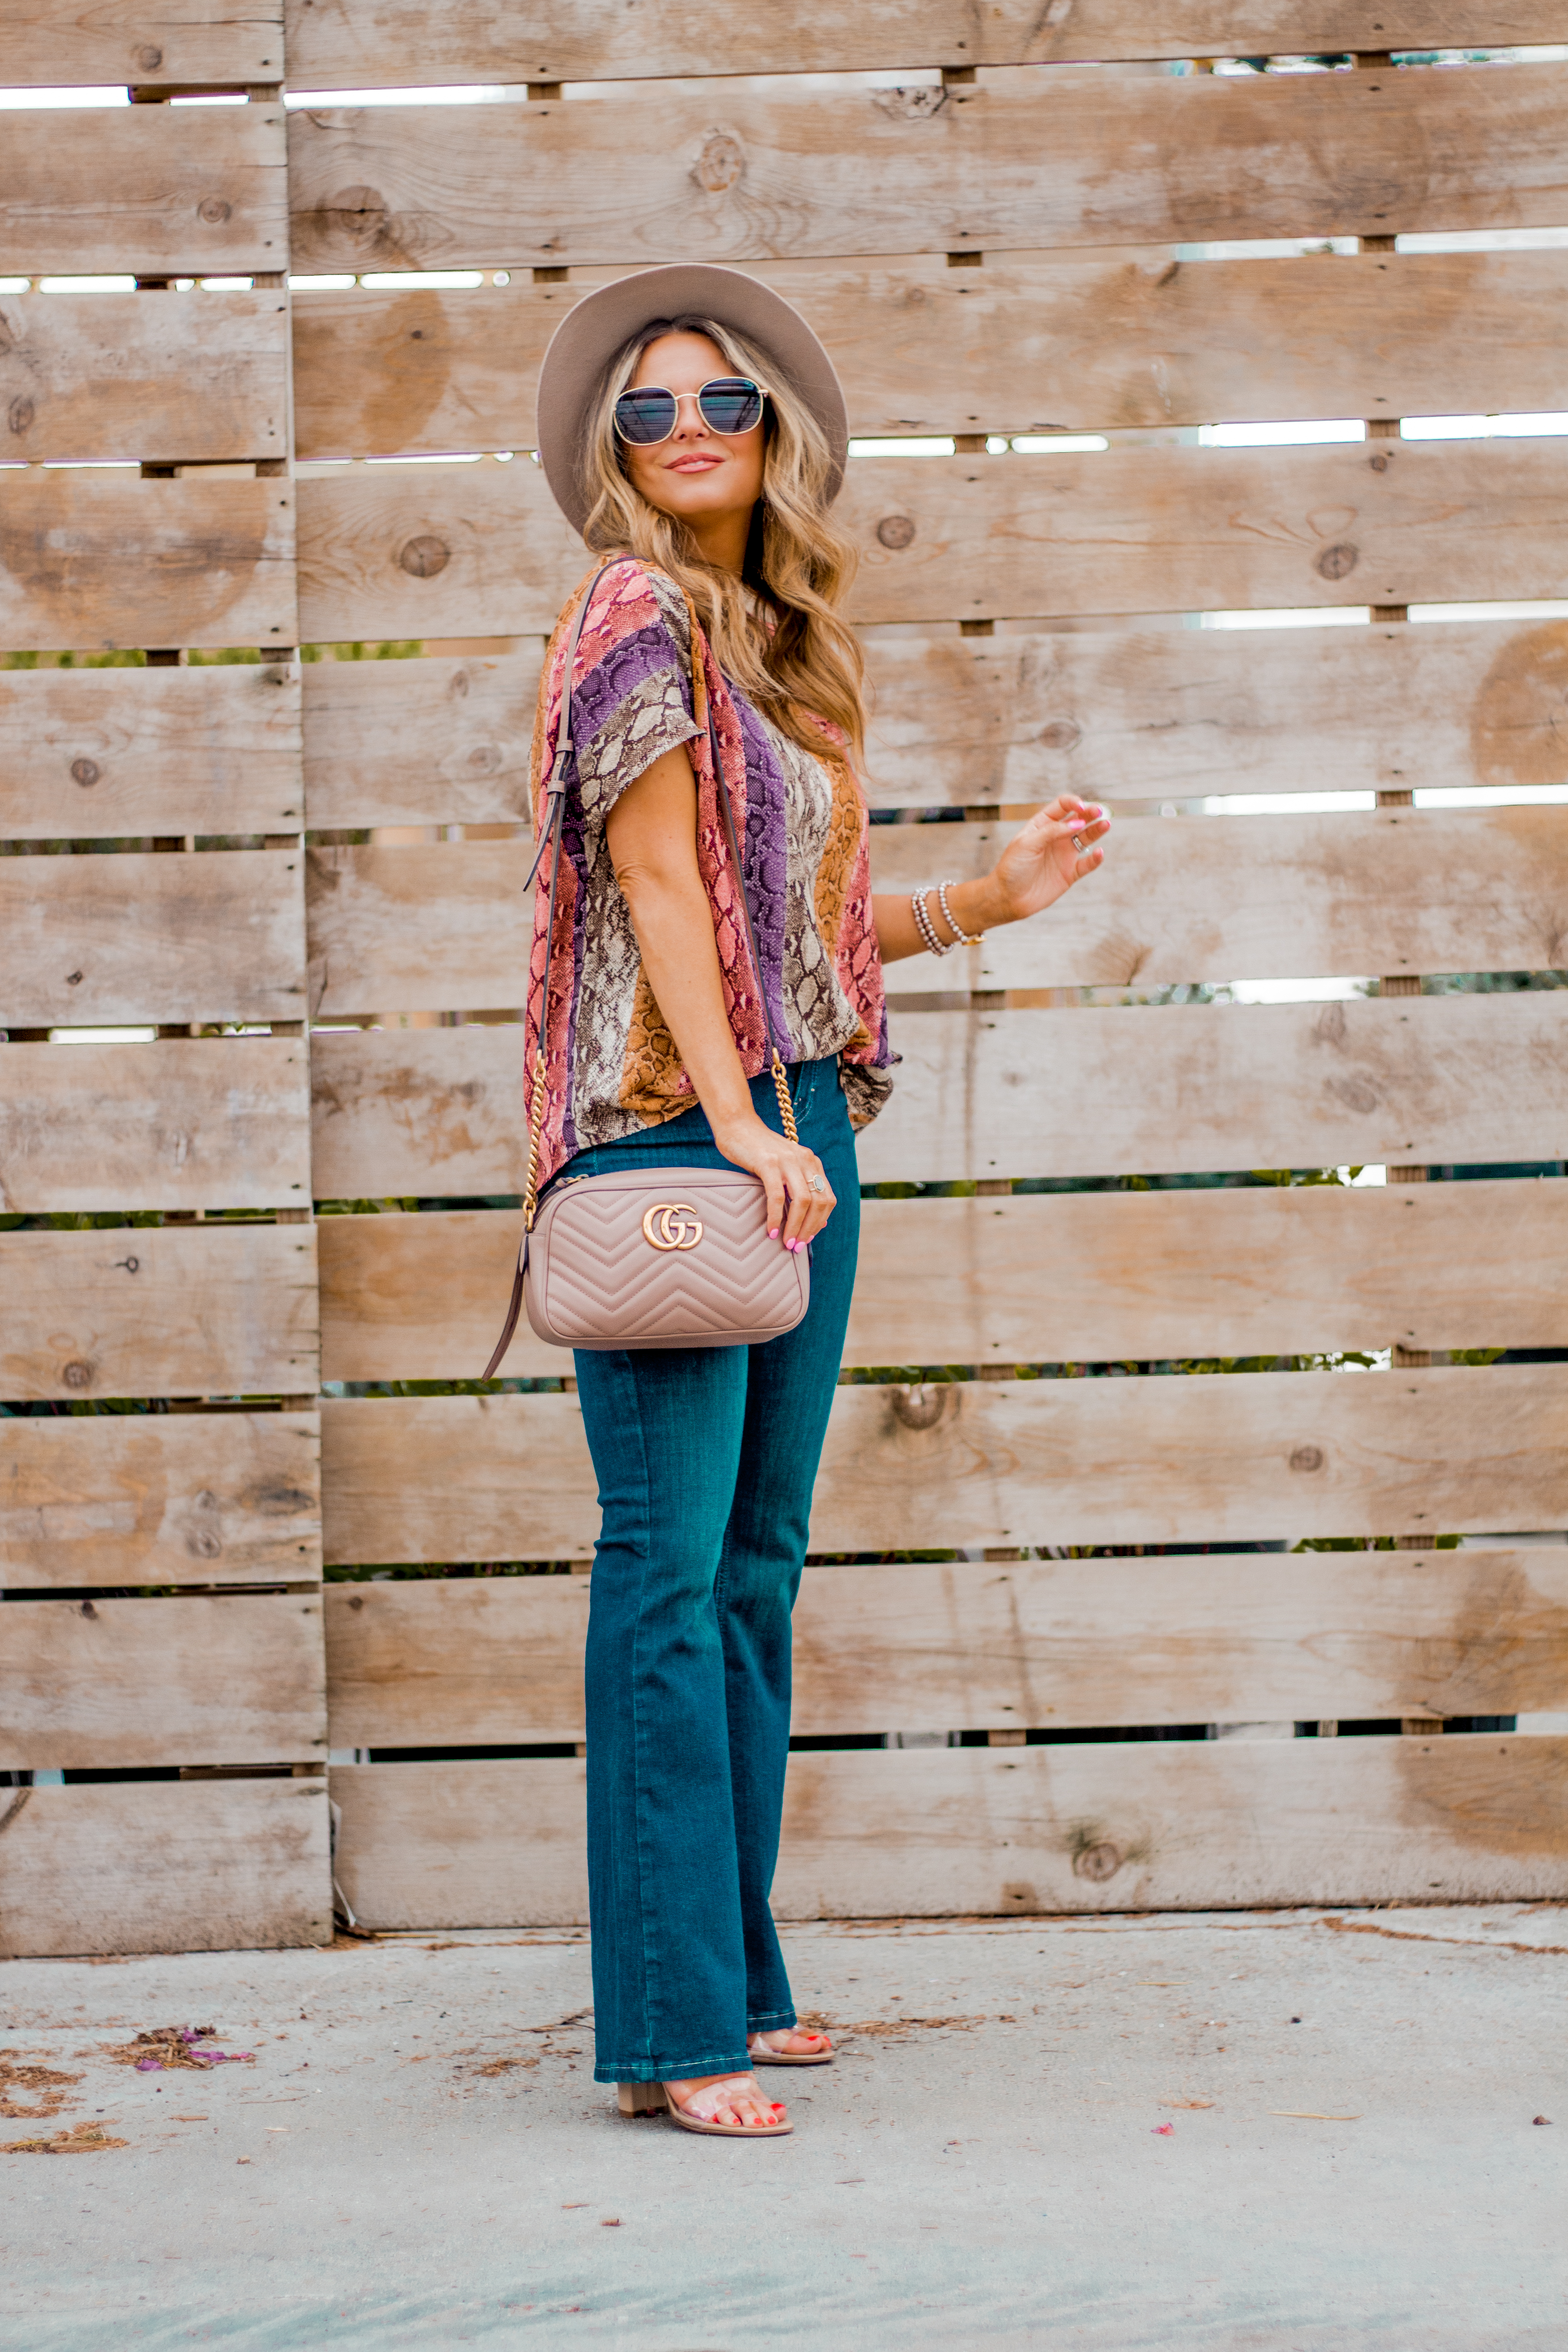 Women's Fashion - Snakeskin Print - Snakeskin Trend - Spring Fashion Trend - Omaha Fashion Blog - Boho Vibes - Flare Jeans - 4